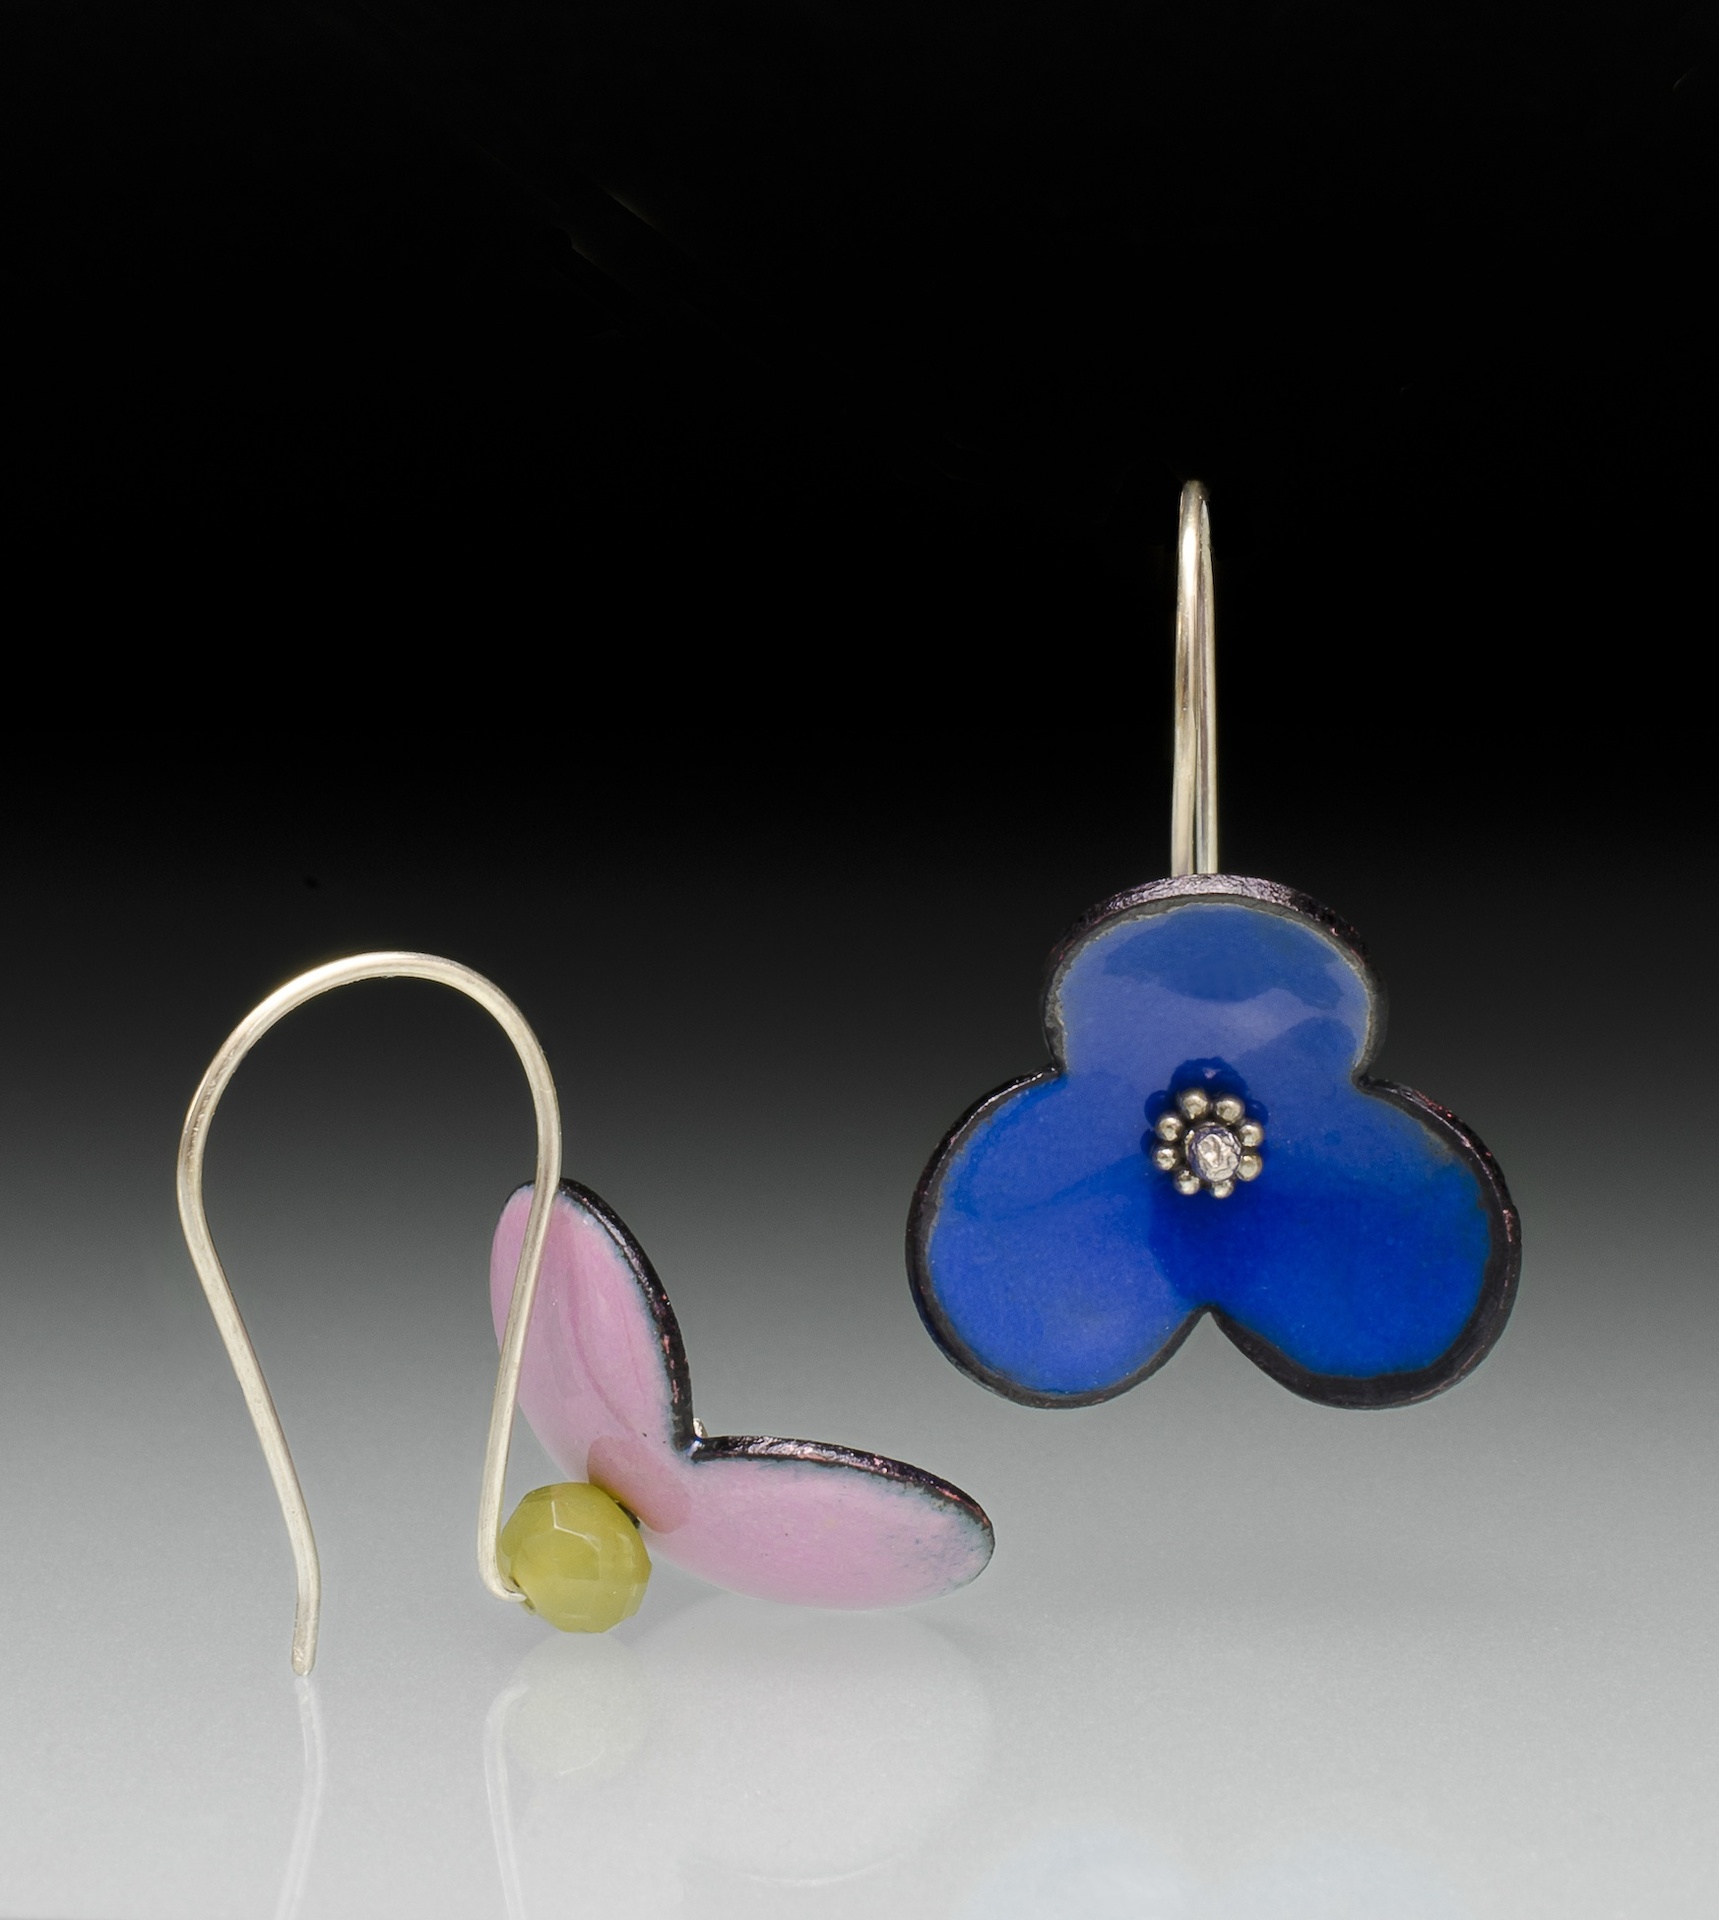 Inna Dzhanibekova • Flower Earrings • Silver, enamel, jade • 1.5 x 0.8 x 0.8 Inches • Enamel earrings with semi-precious stones. • 2018